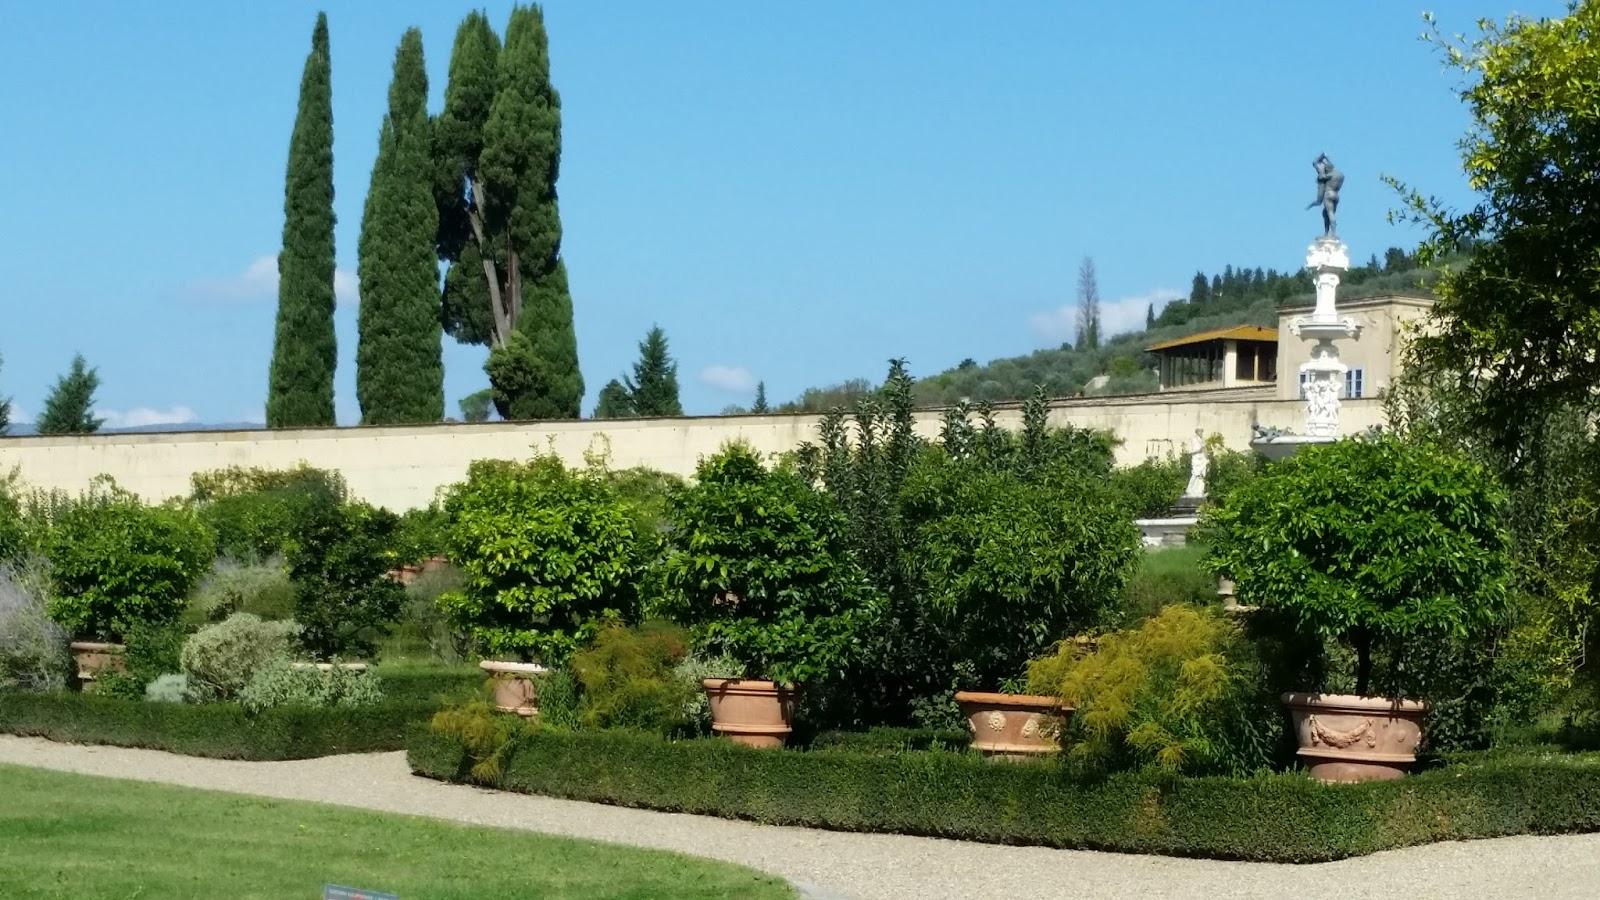 Hortibus voyage palais et jardins prives de toscane for Jardin de toscane